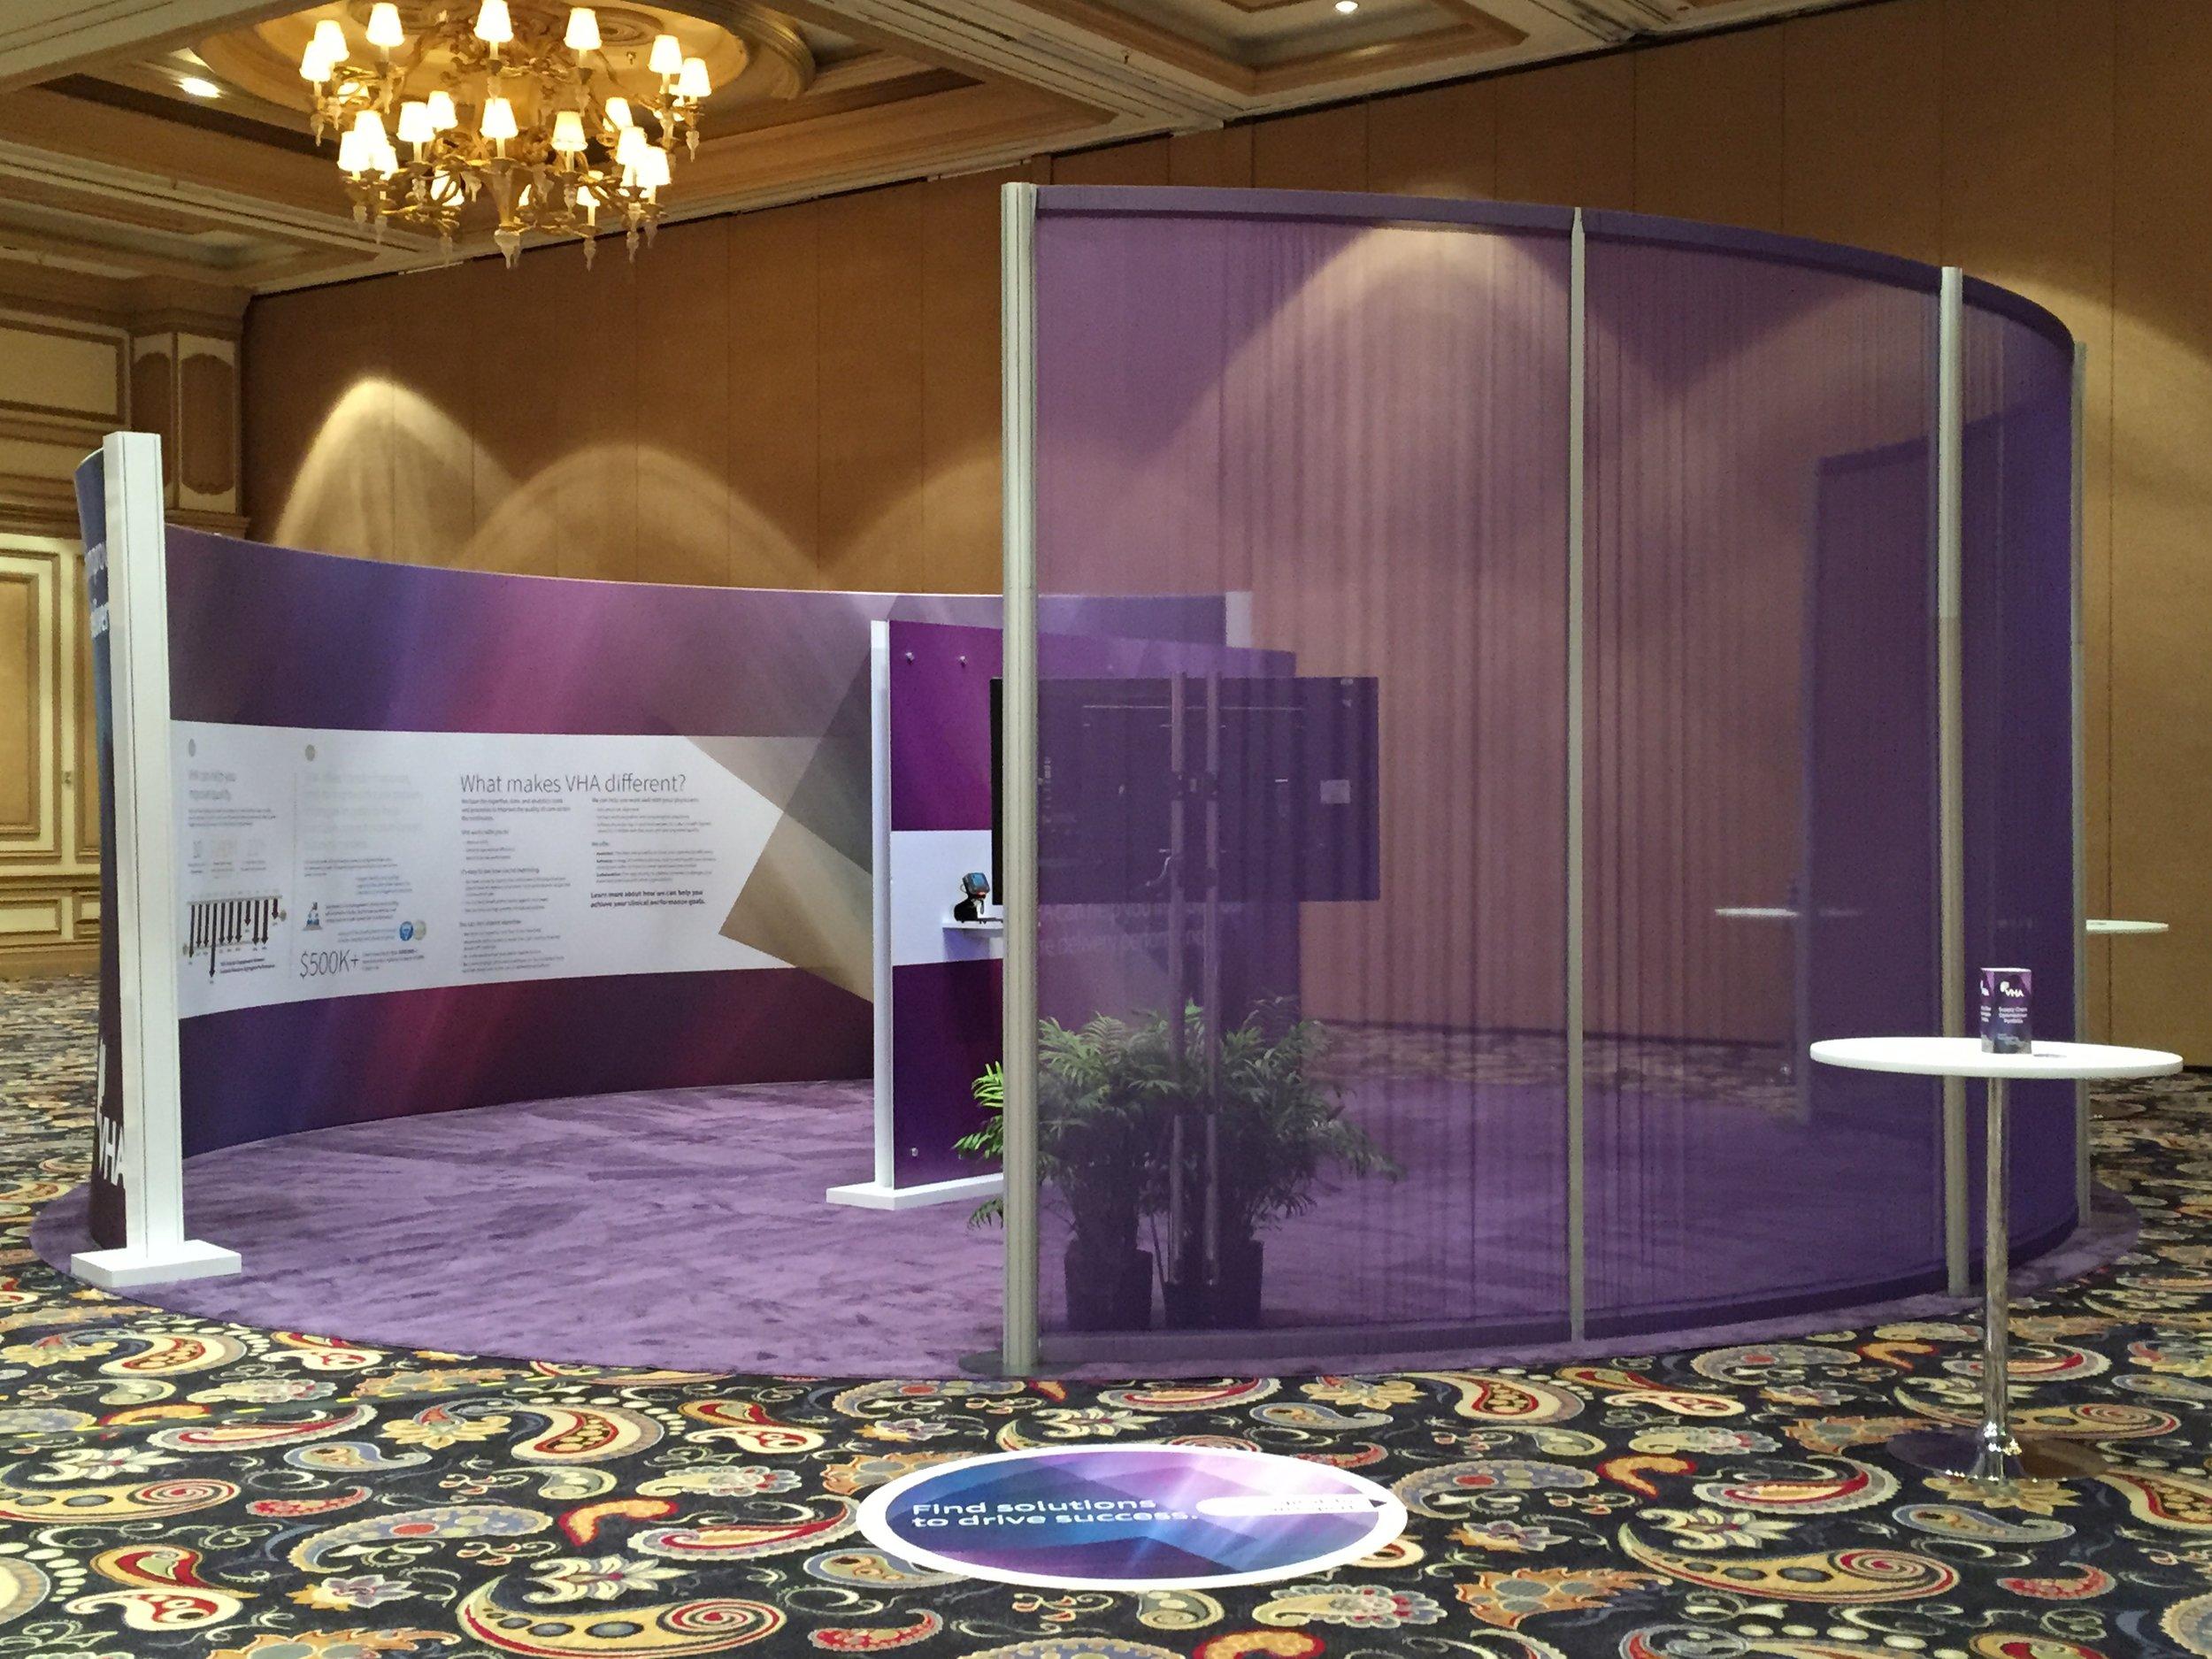 VHA+Summit+Vegas+2015+(3).jpg